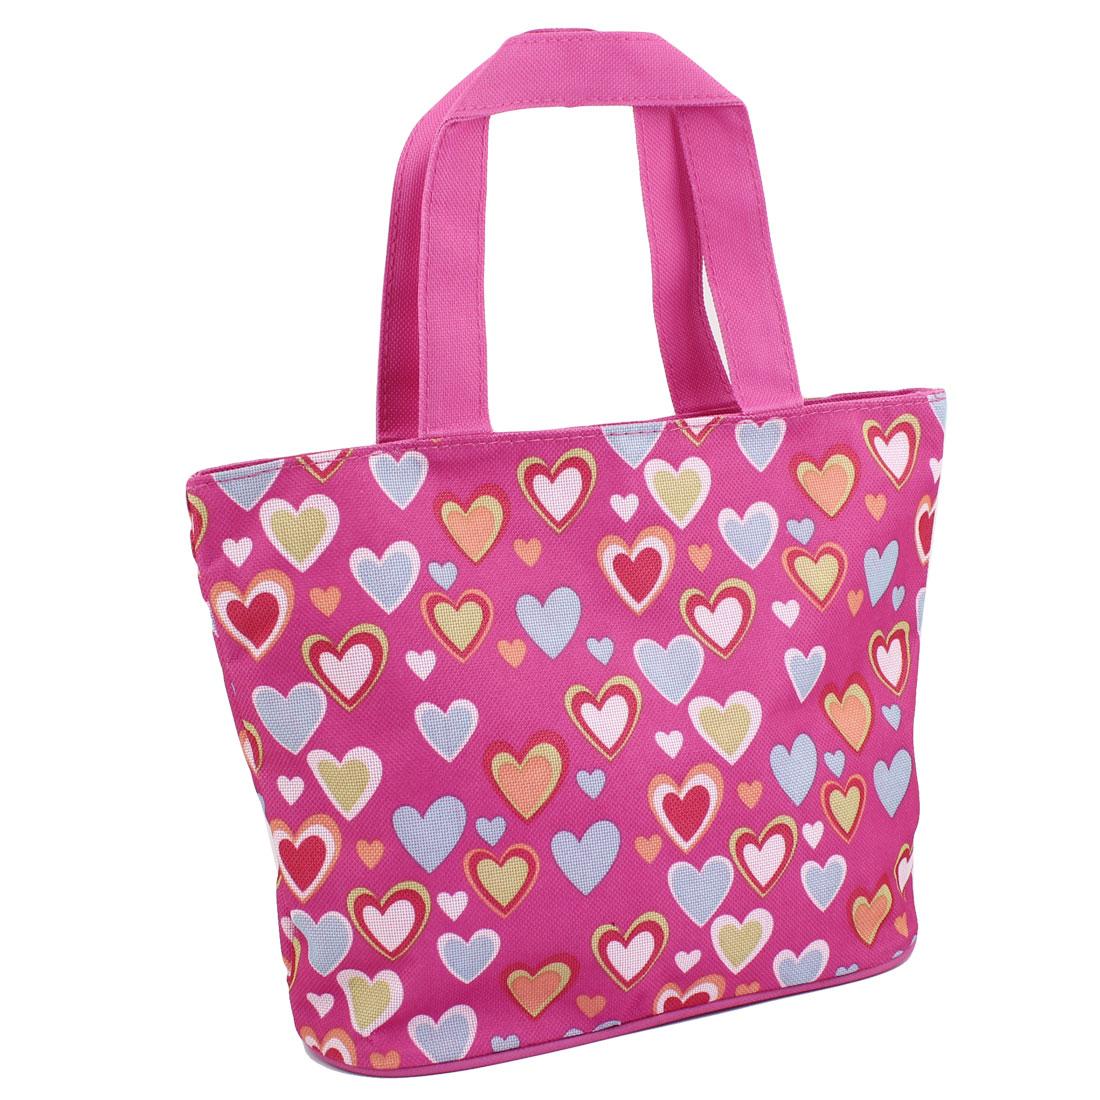 Household Heart Pattern Zip Up Foldable Shopping Handbag Hand Bag Tote Fuchsia